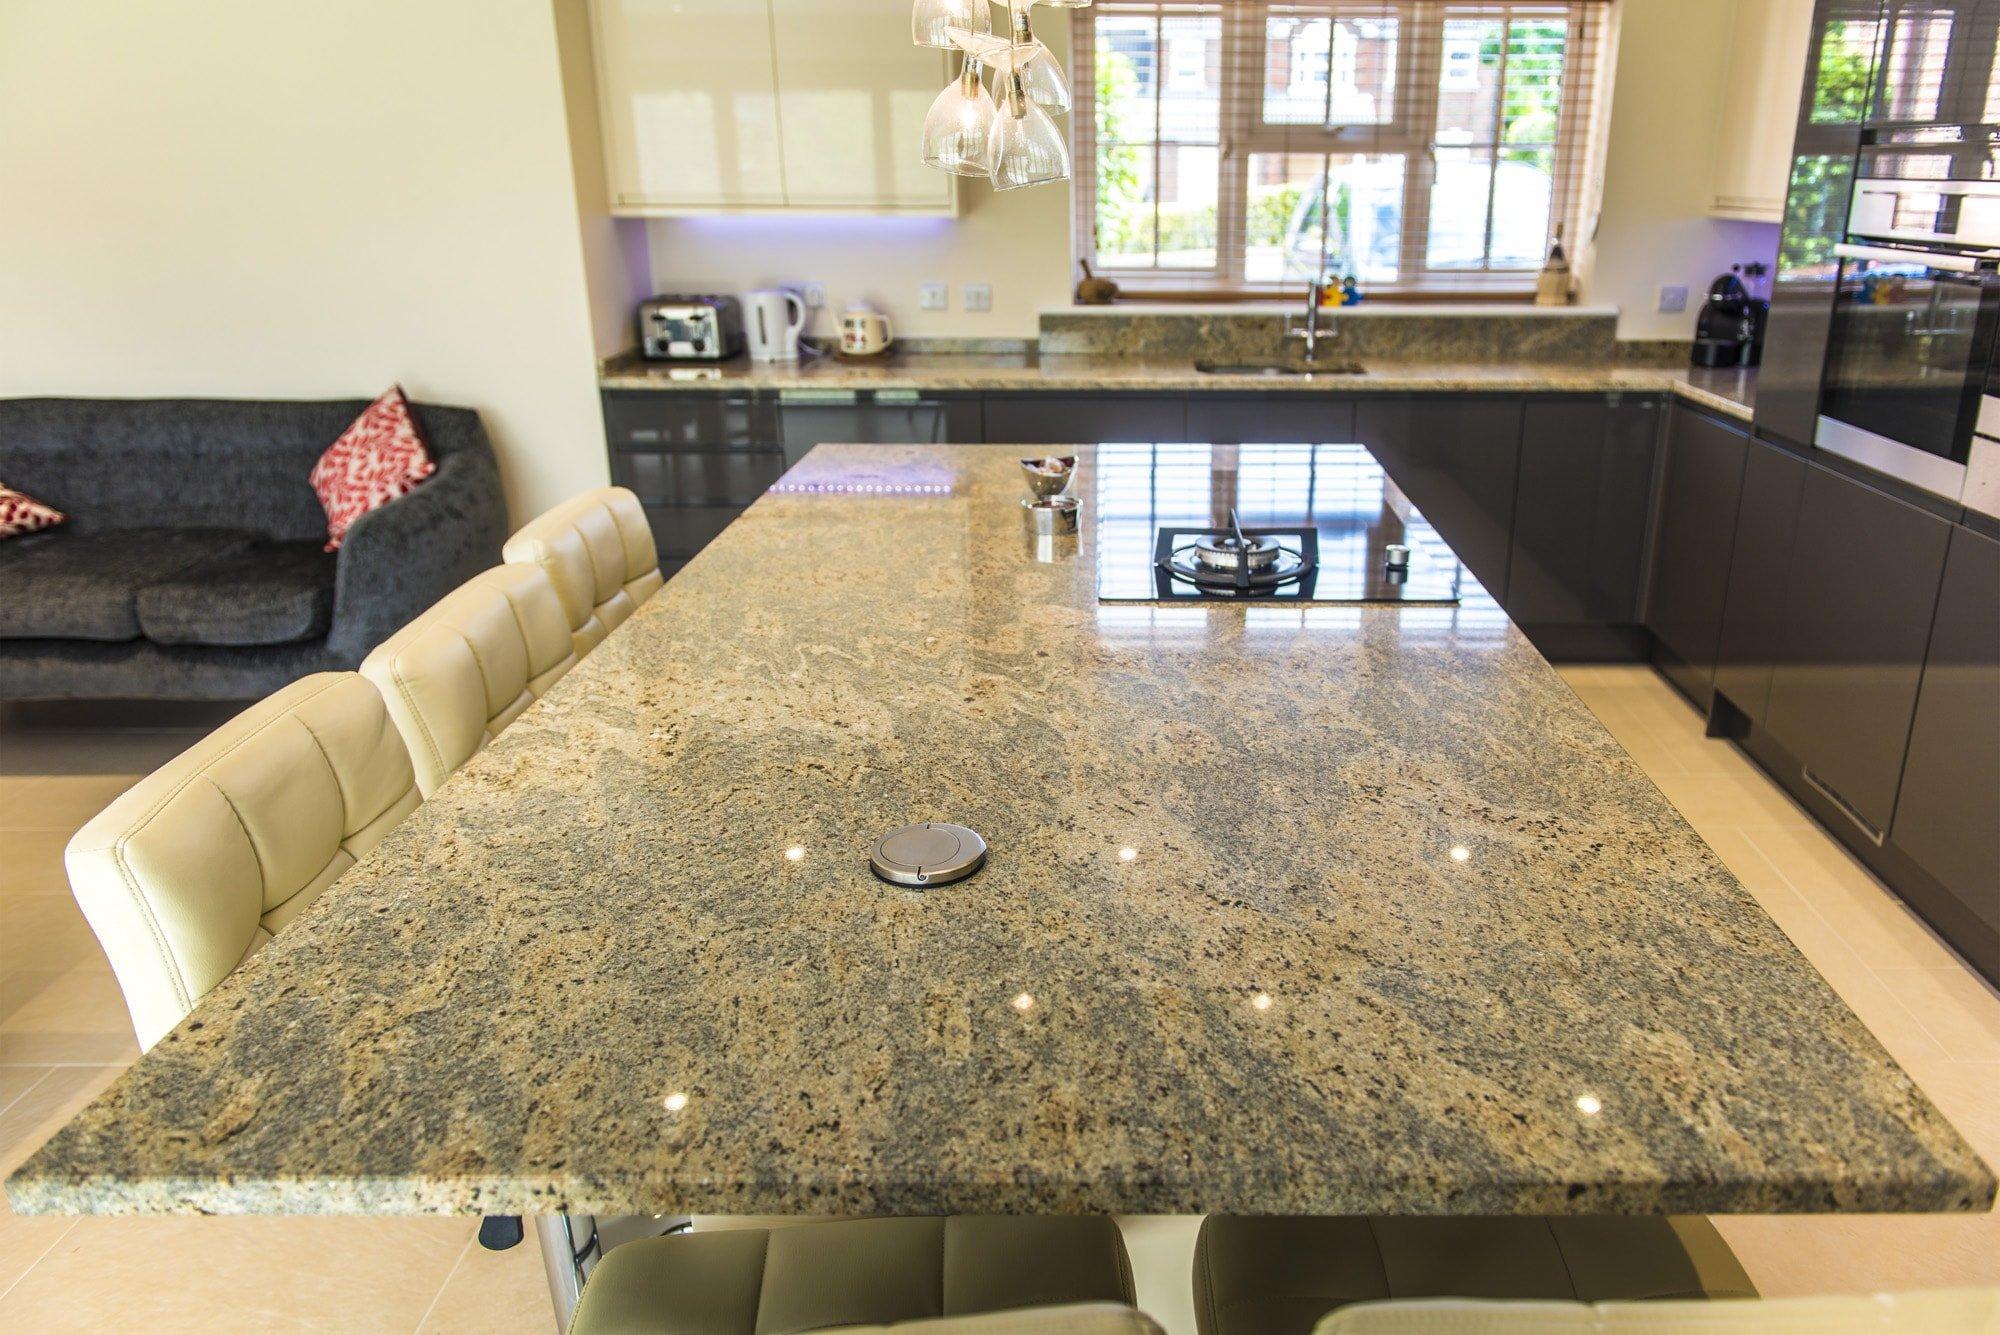 kashmir-gold-granite-horsham-113307-a-island-min